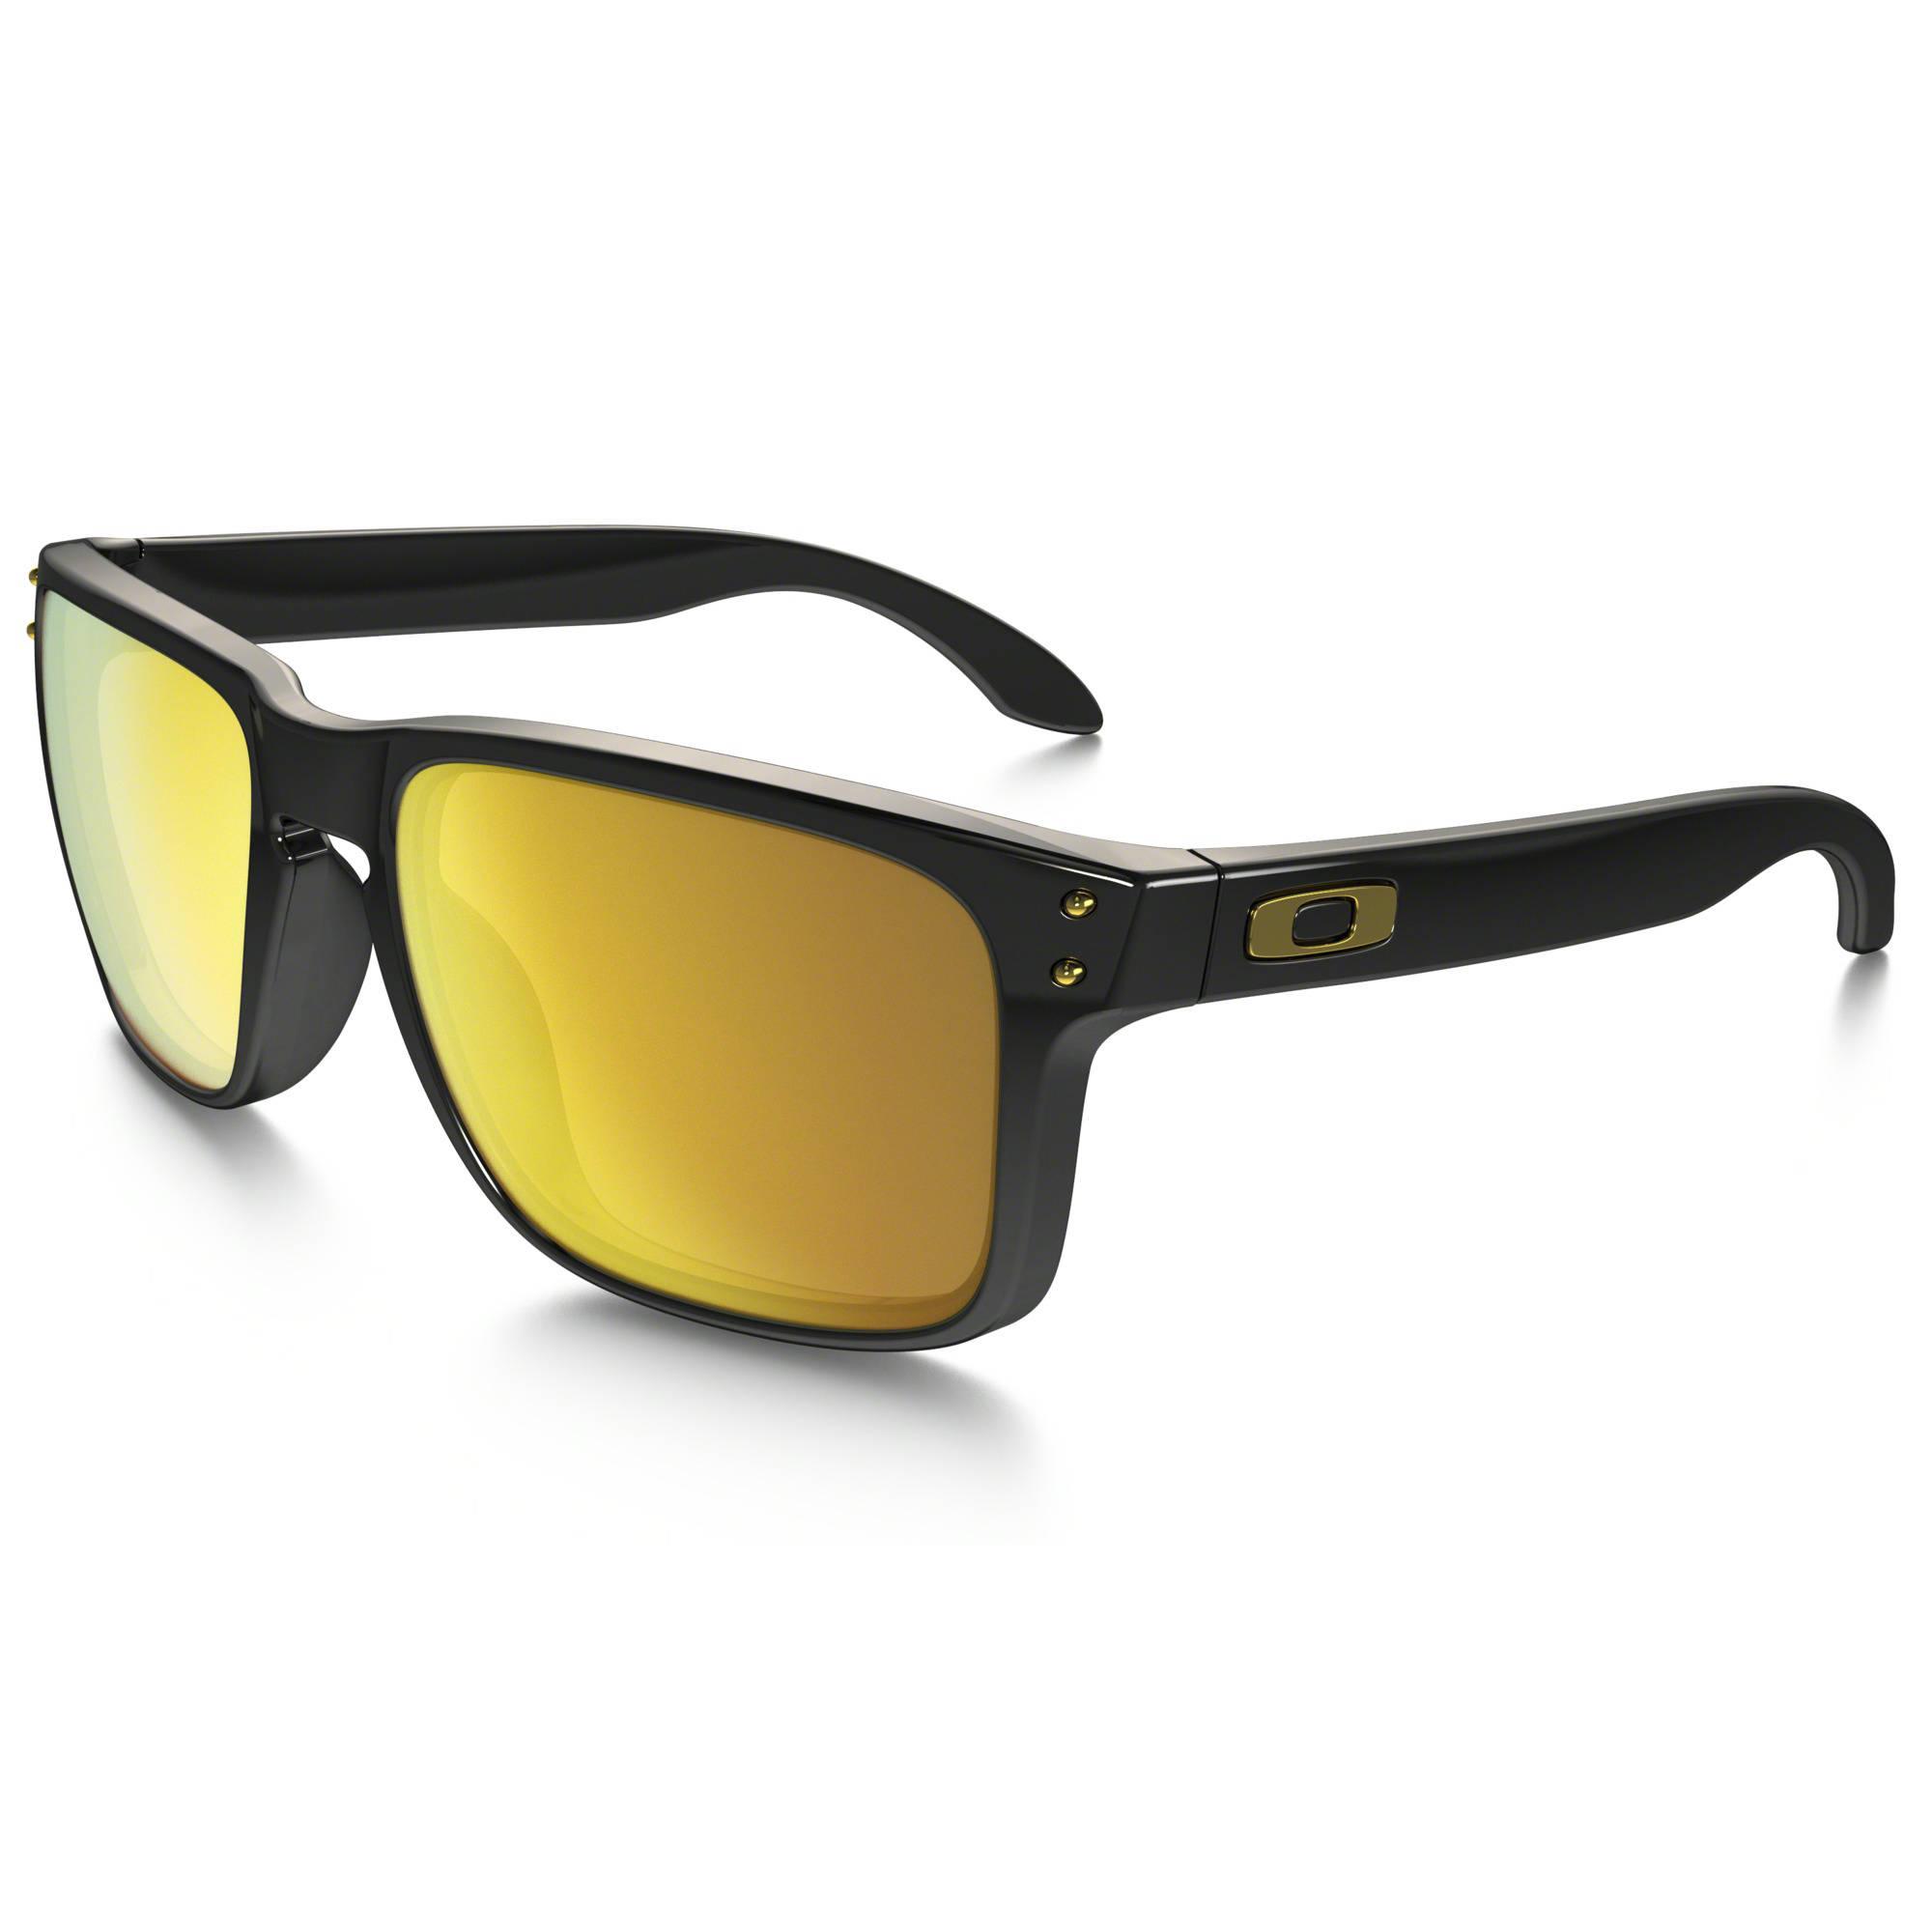 b2928de69b Oakley Shaun White Holbrook Sunglasses 0OO9102-91020855 B H